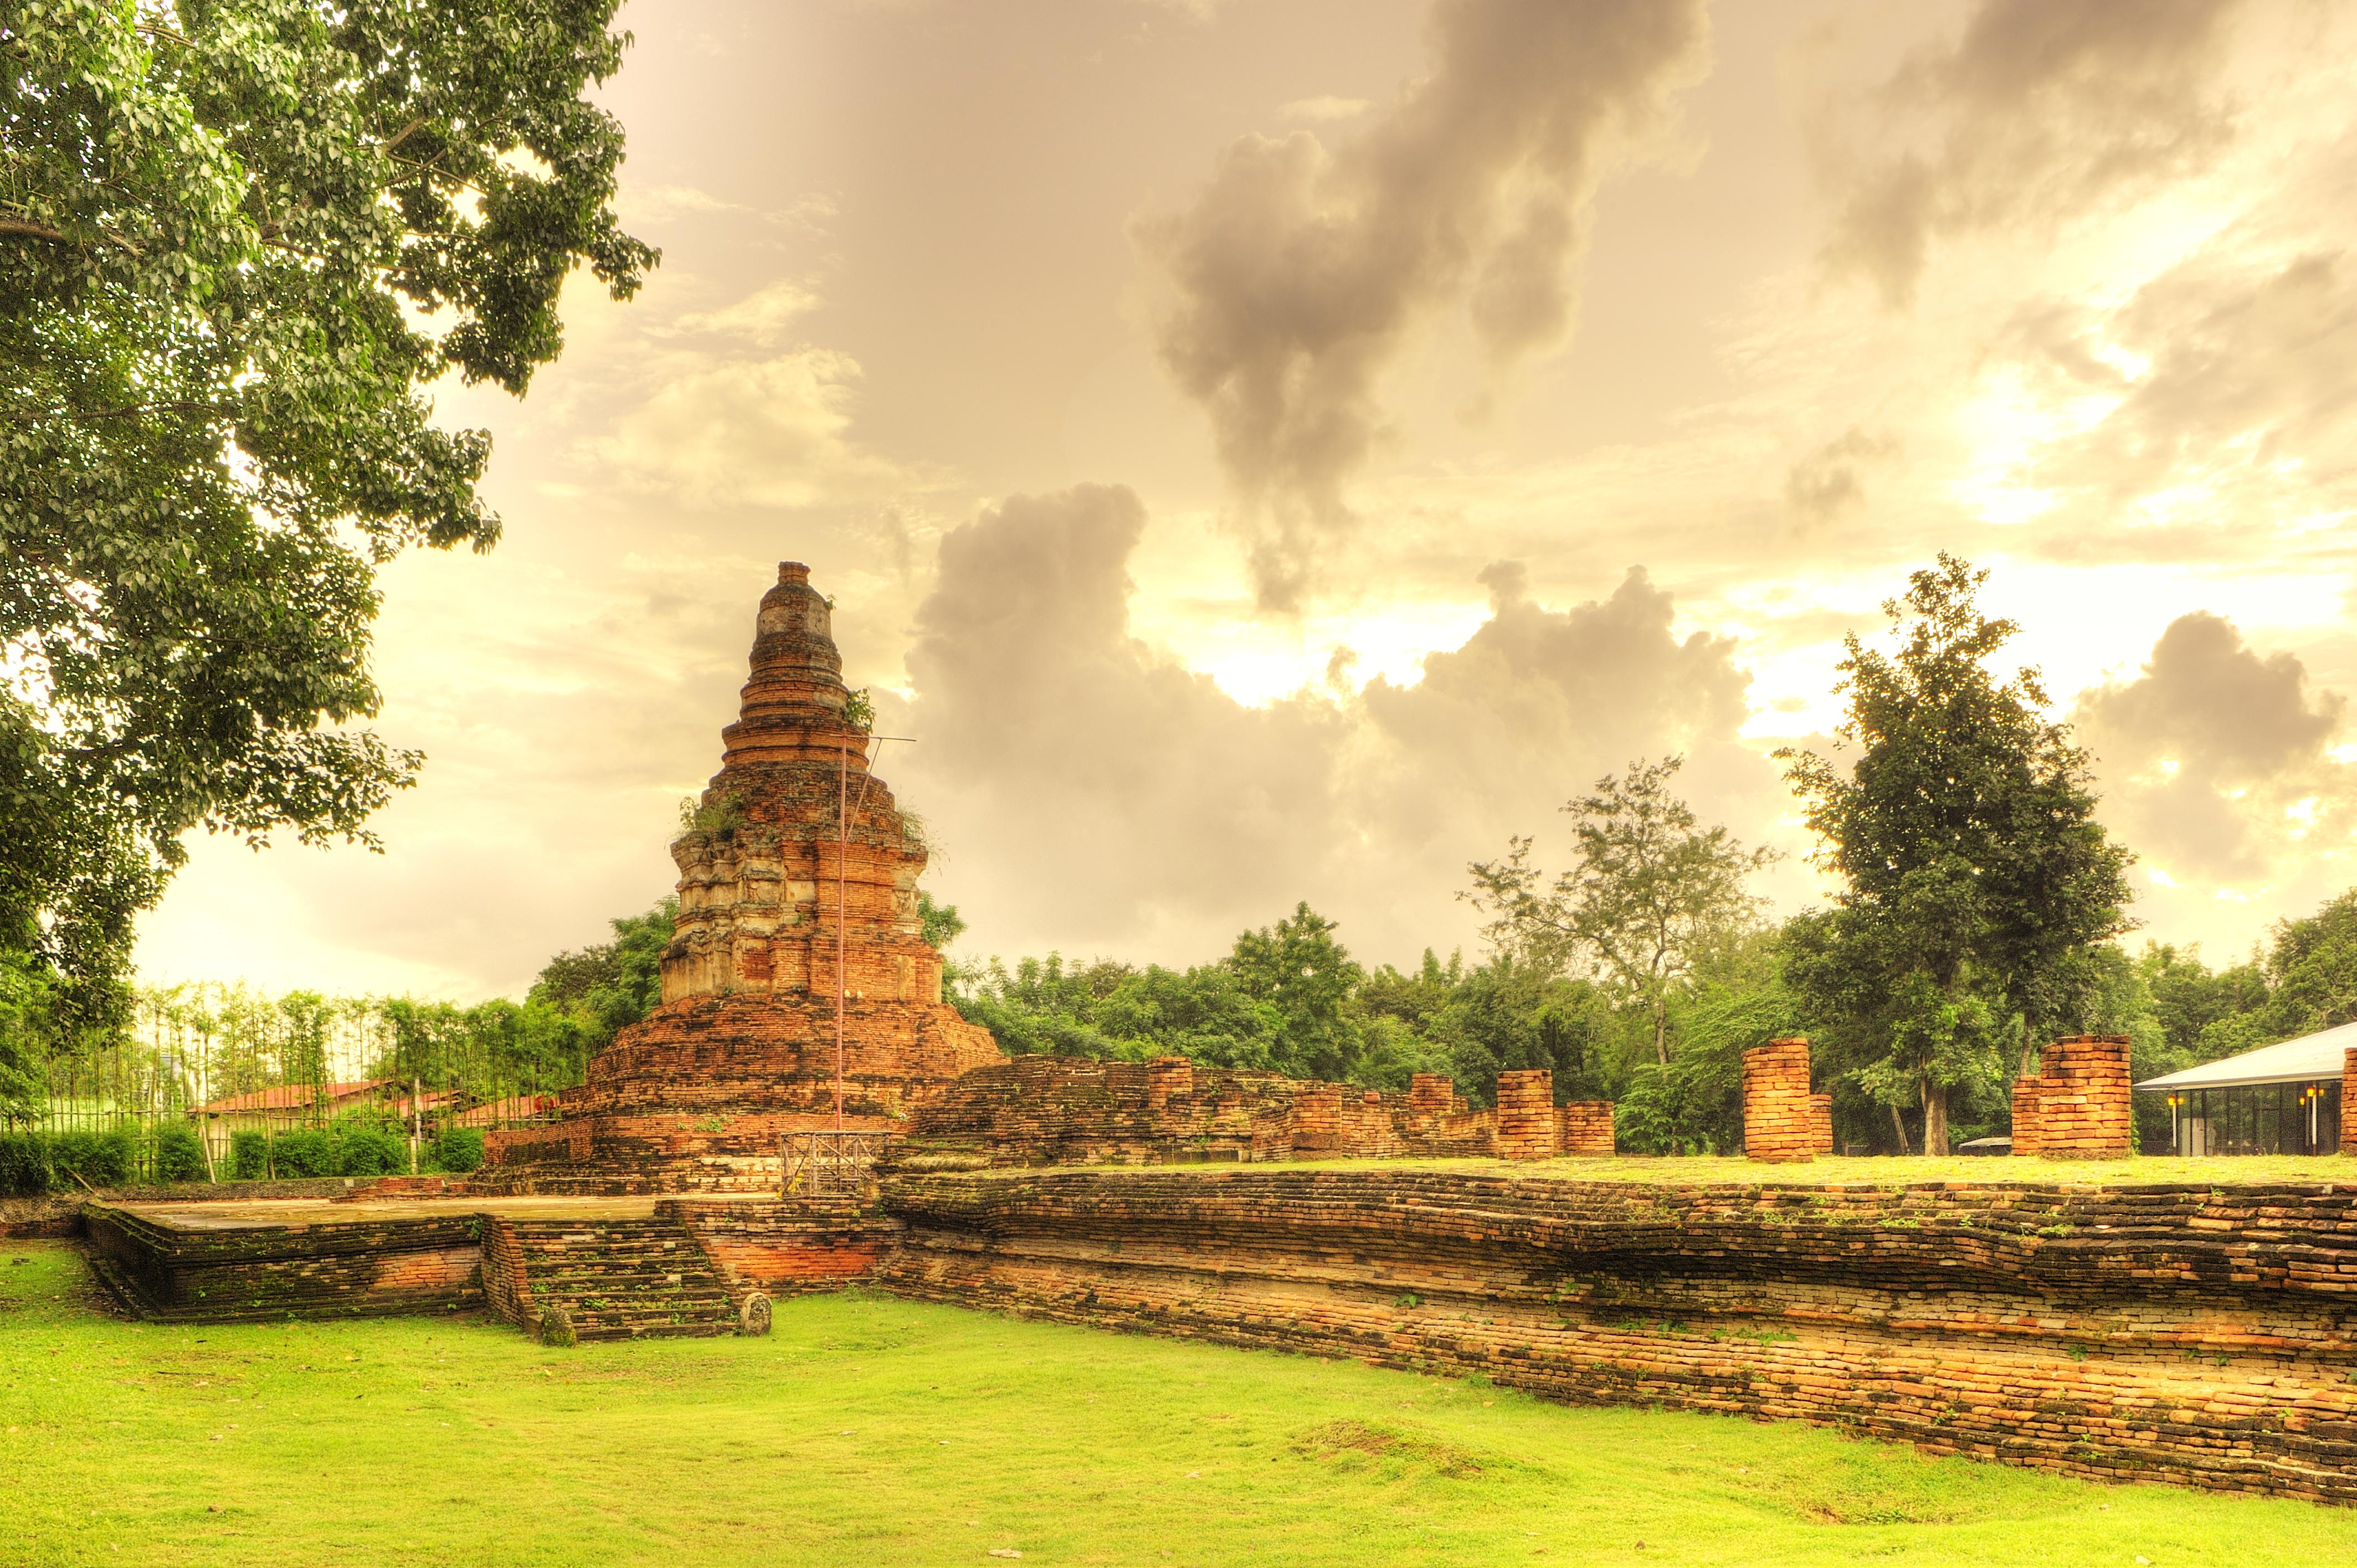 Chiang Mai Desktop Images